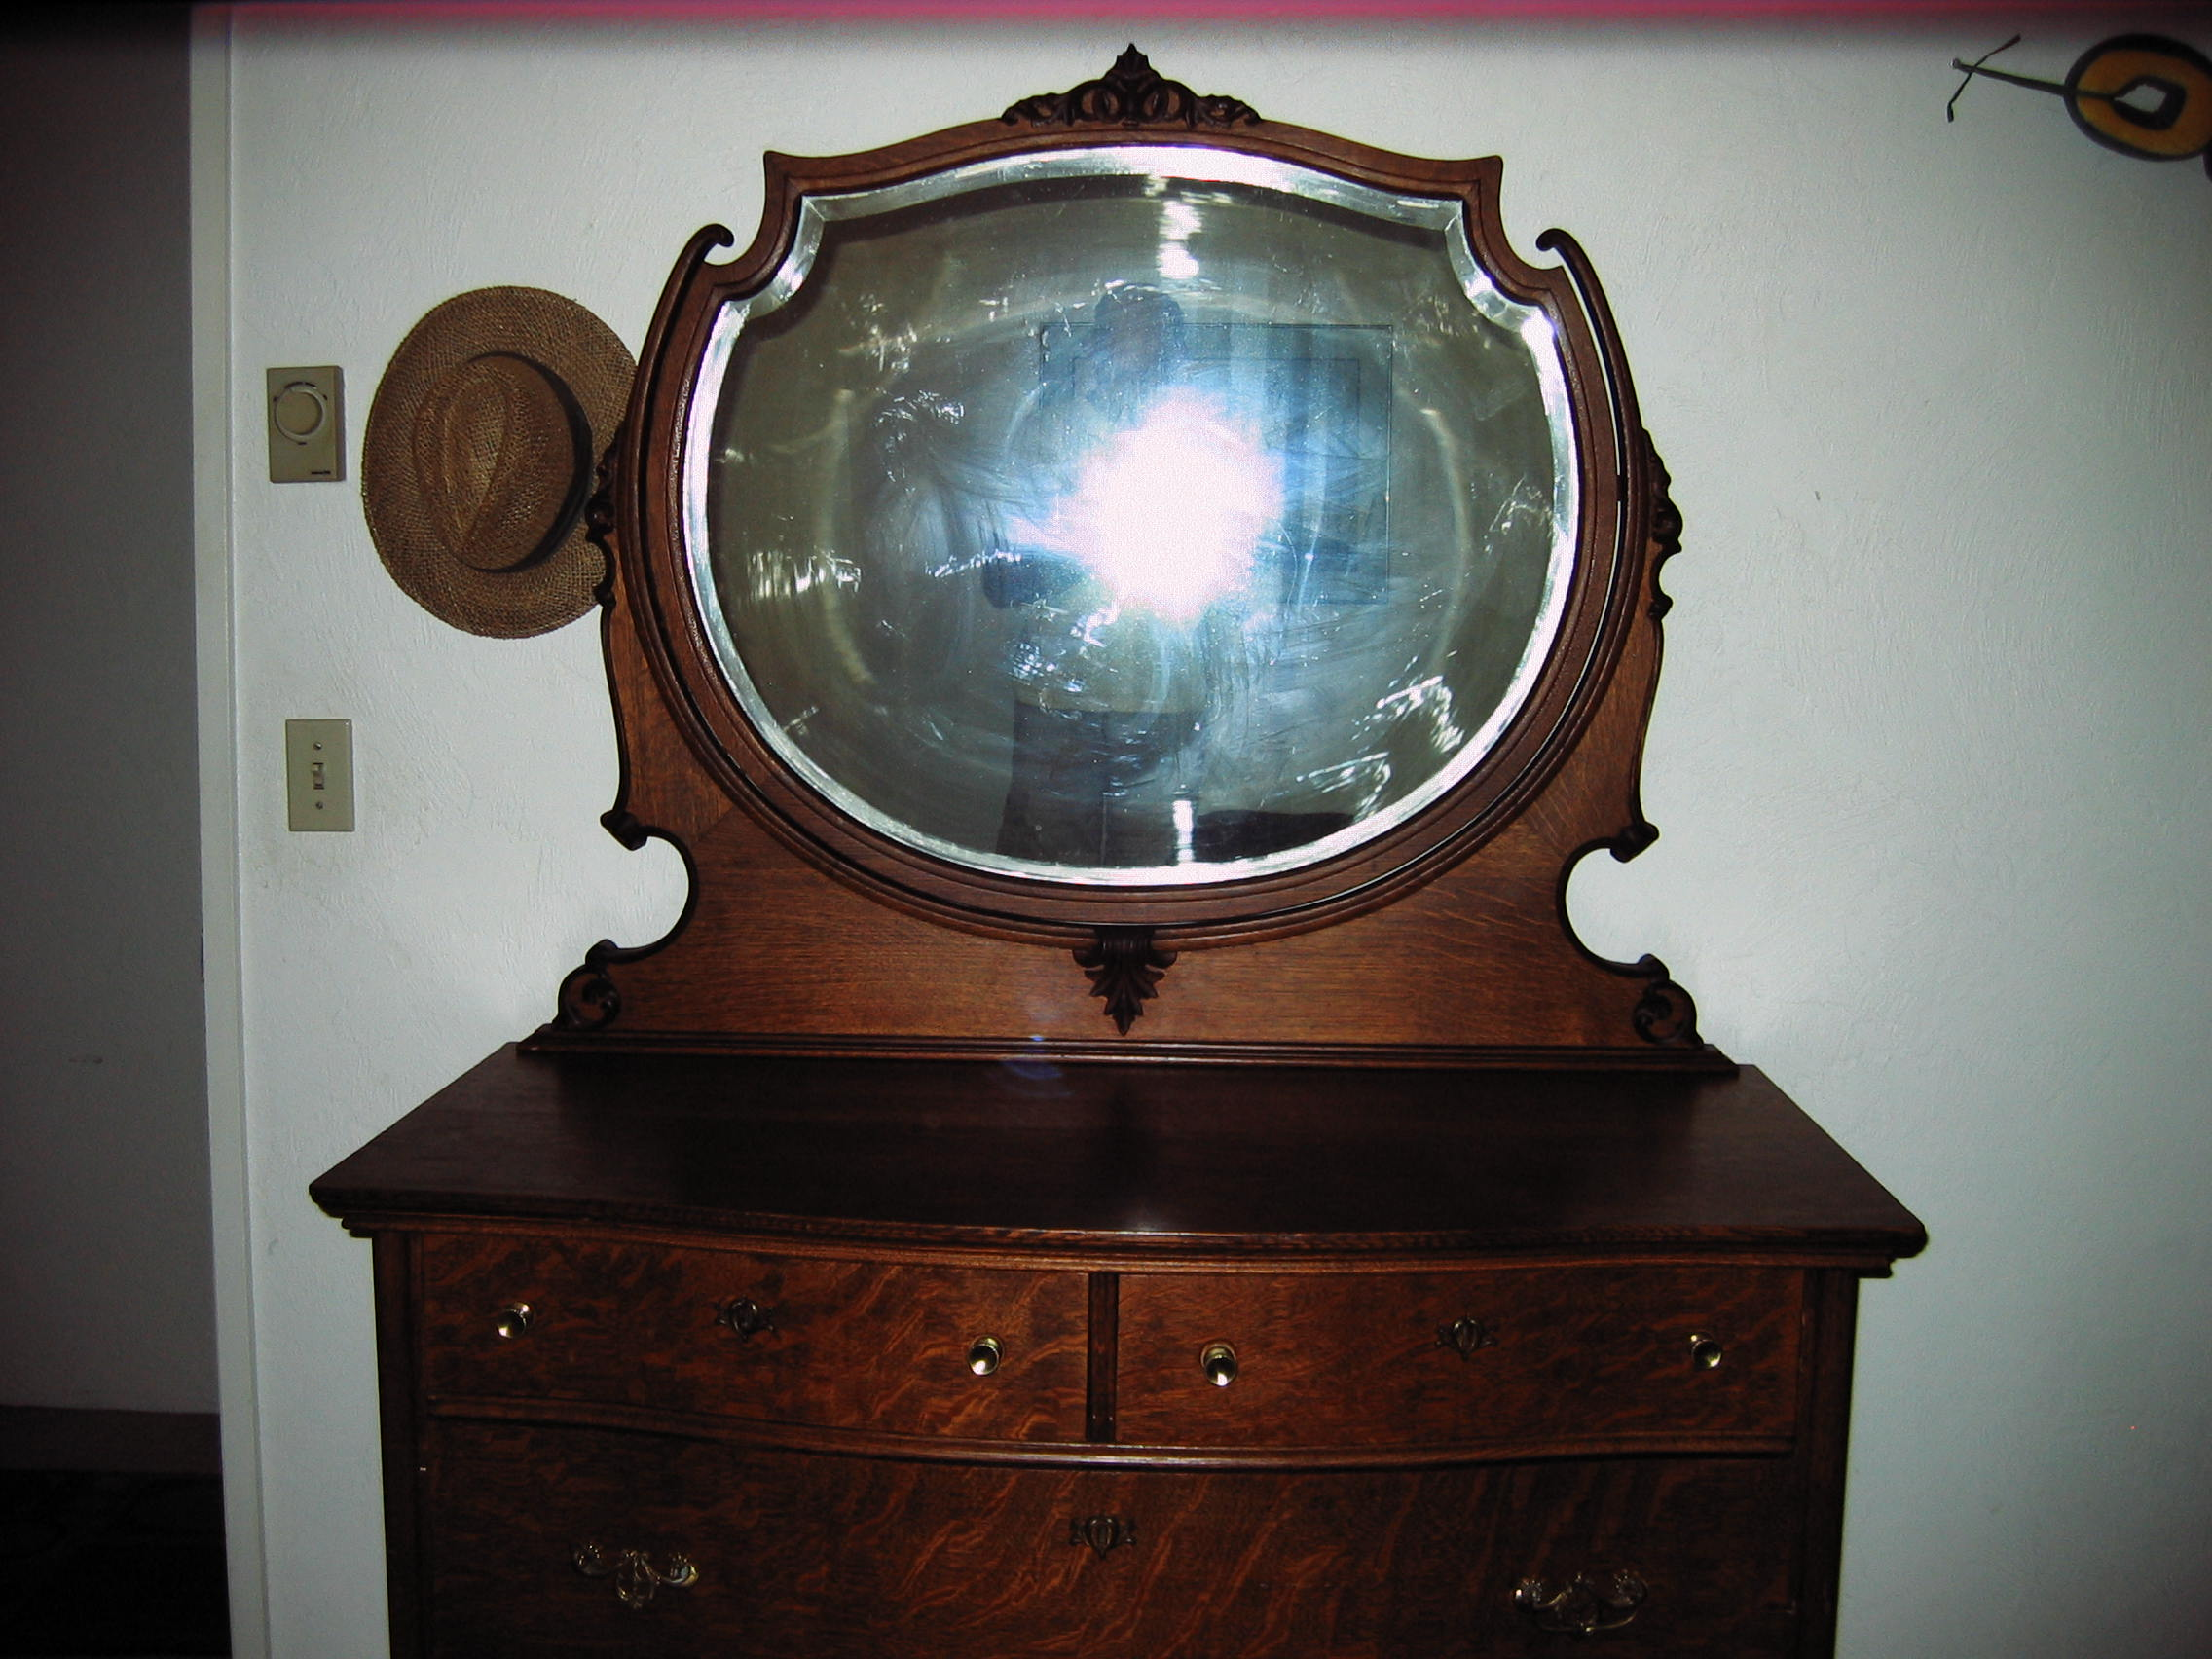 Have Dresser W Mirror Skeleton Key Locks Wooden Wheels Br Hardware Oak Inlaid Frame Very Good Condition Picture